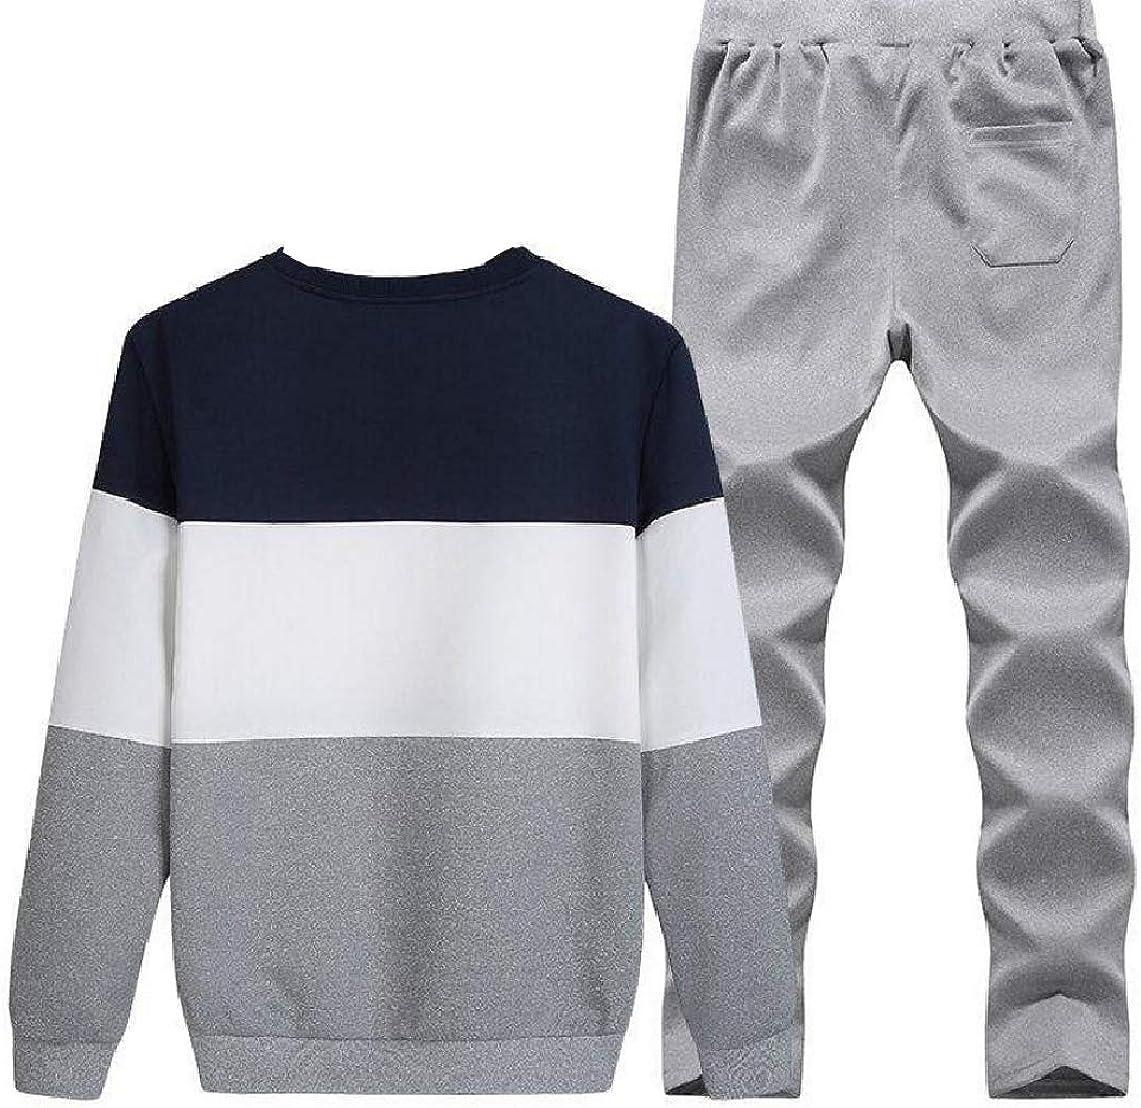 KaWaYi Mens 2-Piece Set Activewear Long Sleeve Track Set